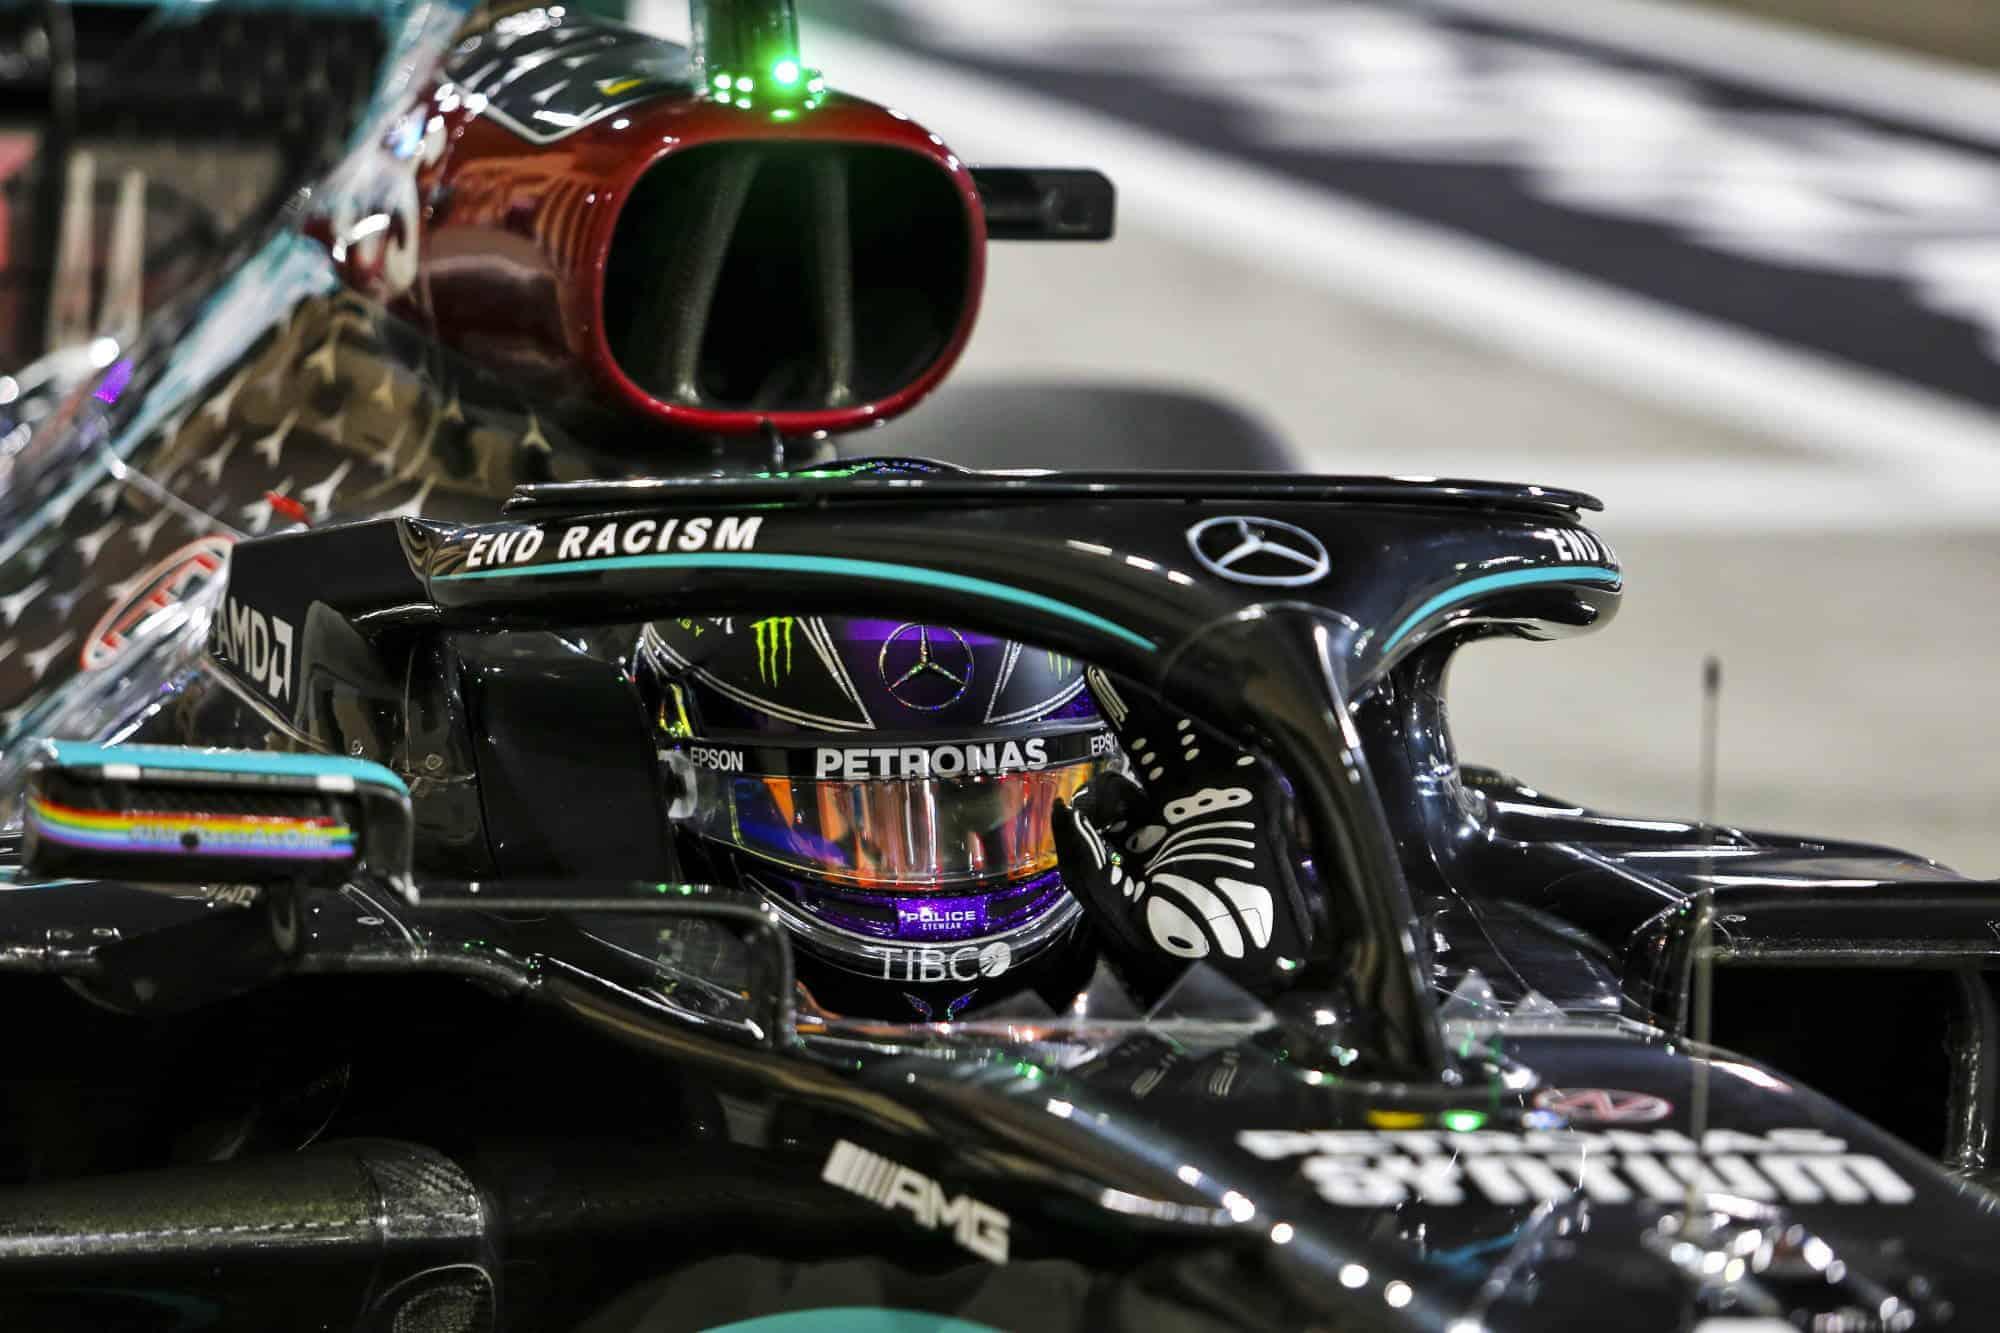 2020 Bahrain GP Hamilton Mercedes after qualifying Photo Pirelli Mercedes